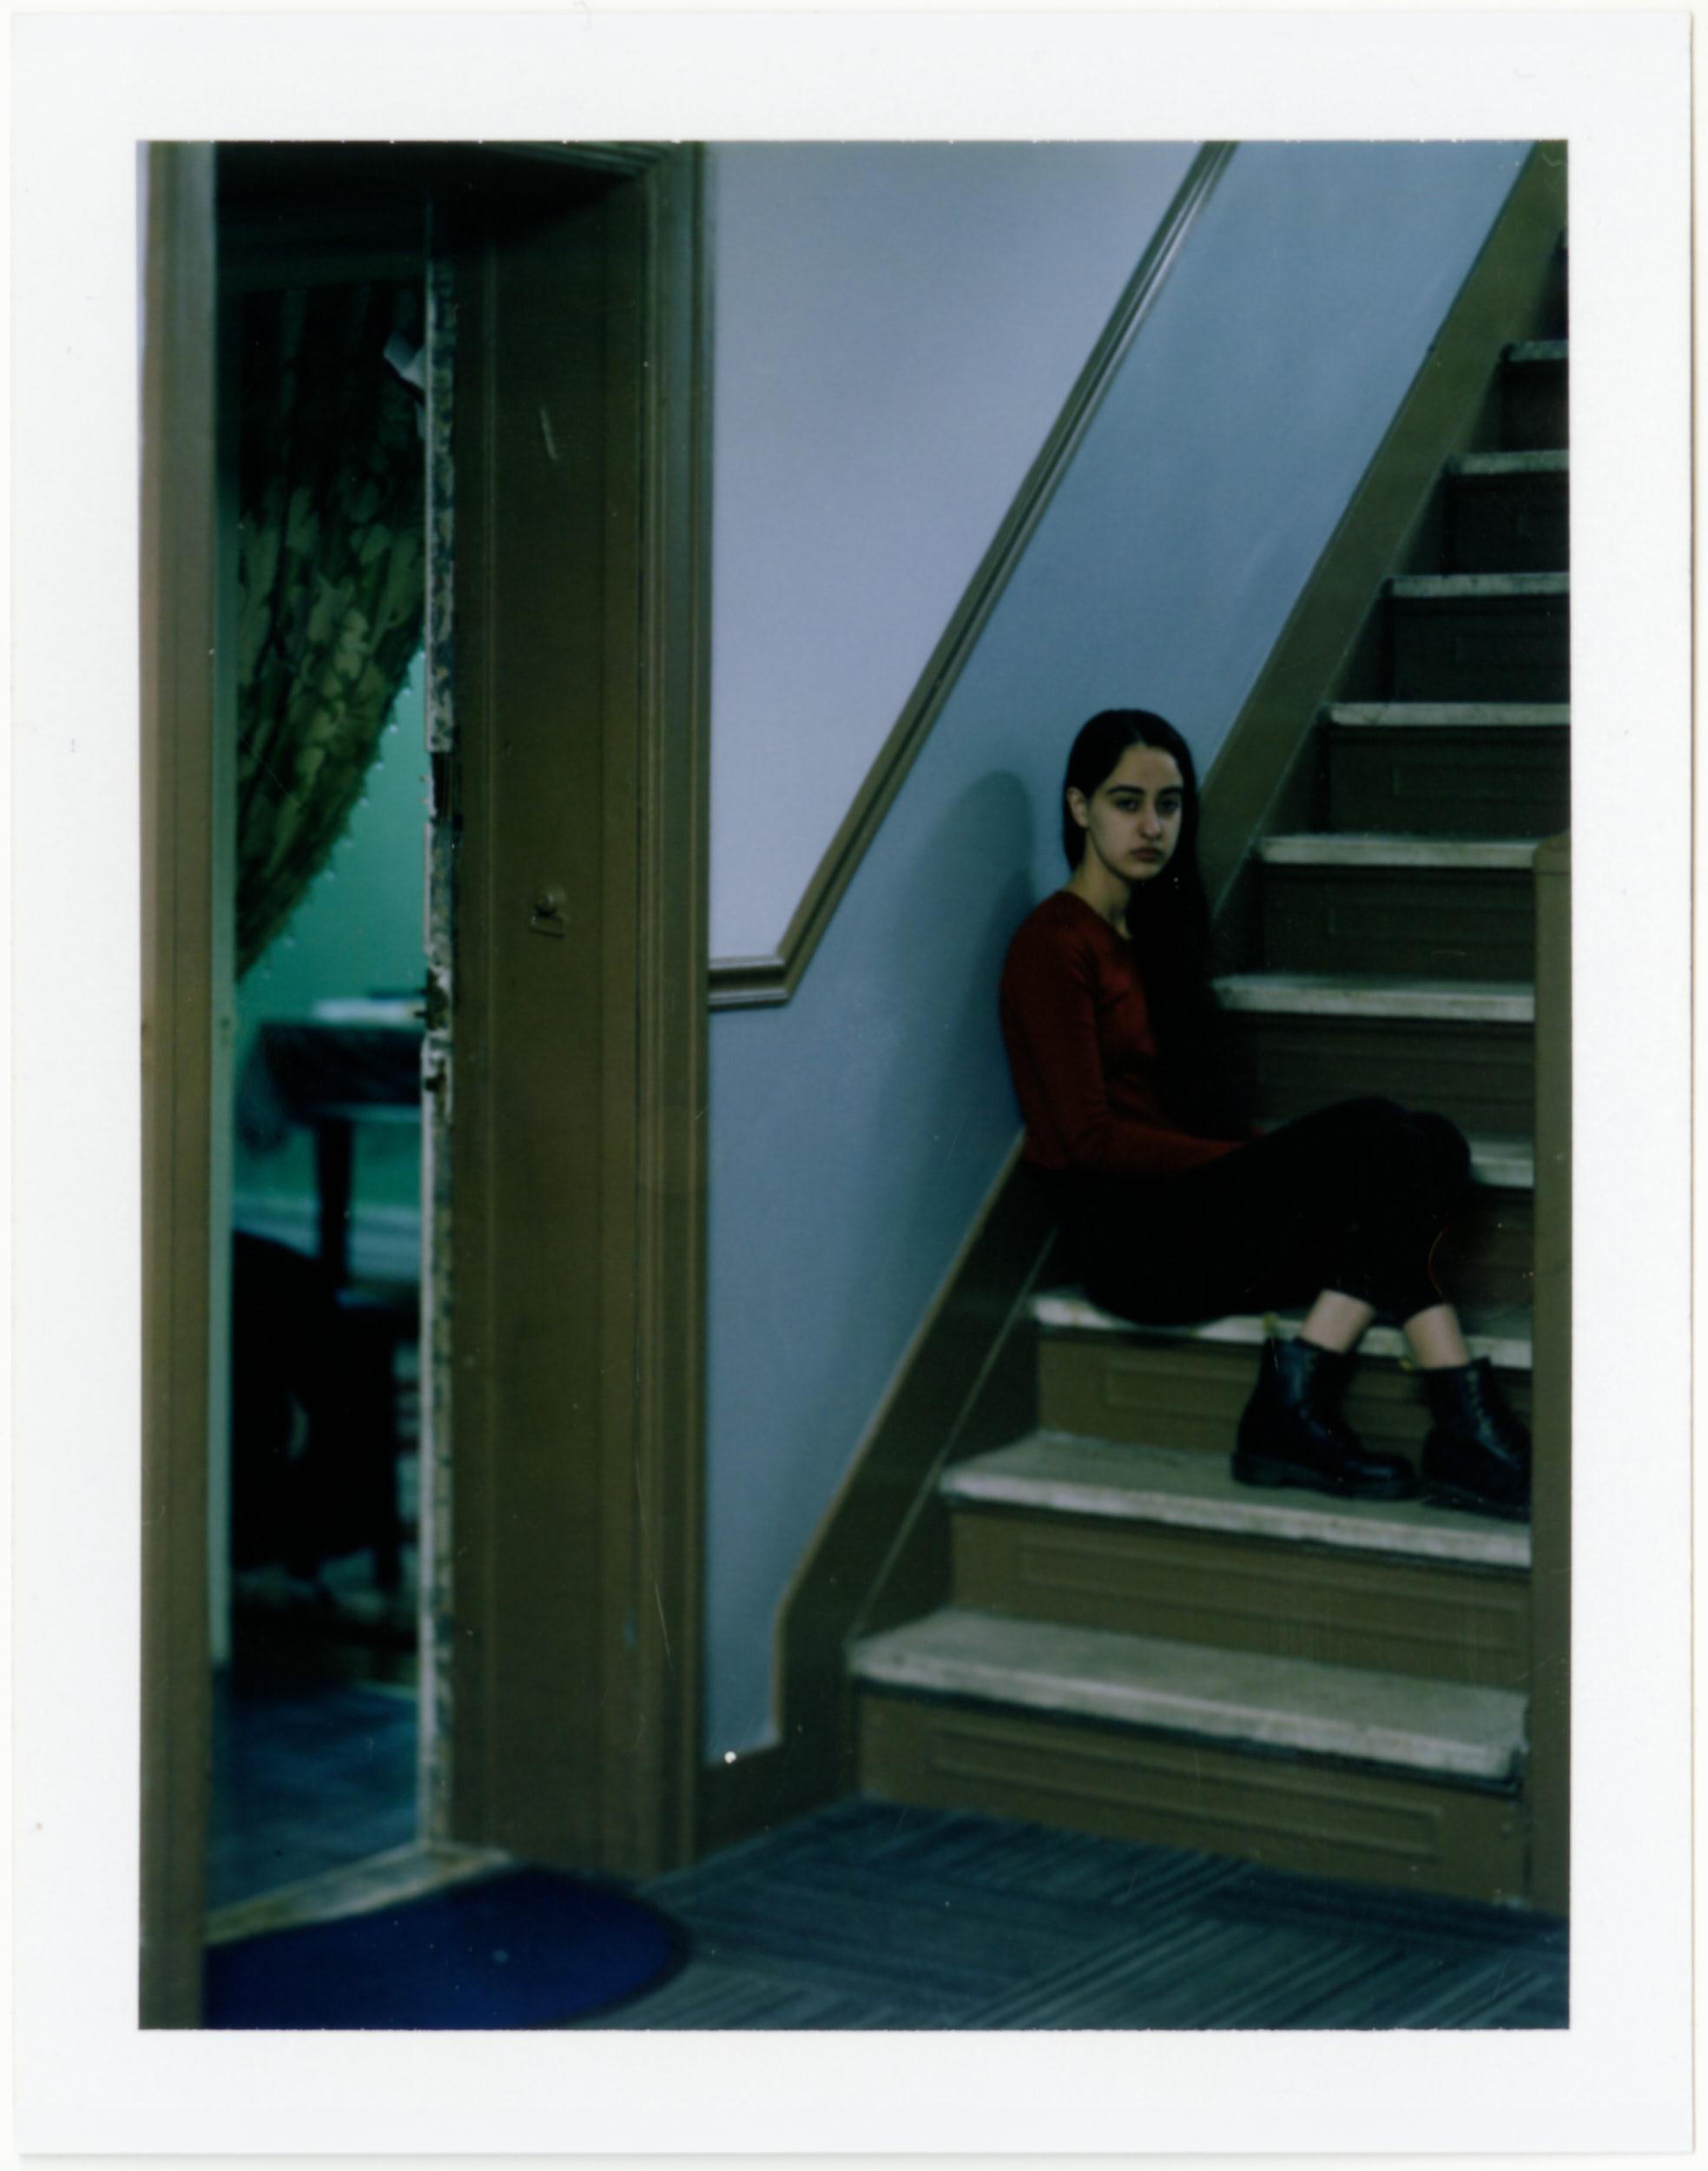 Yashna-polaroid-0005 4.jpg